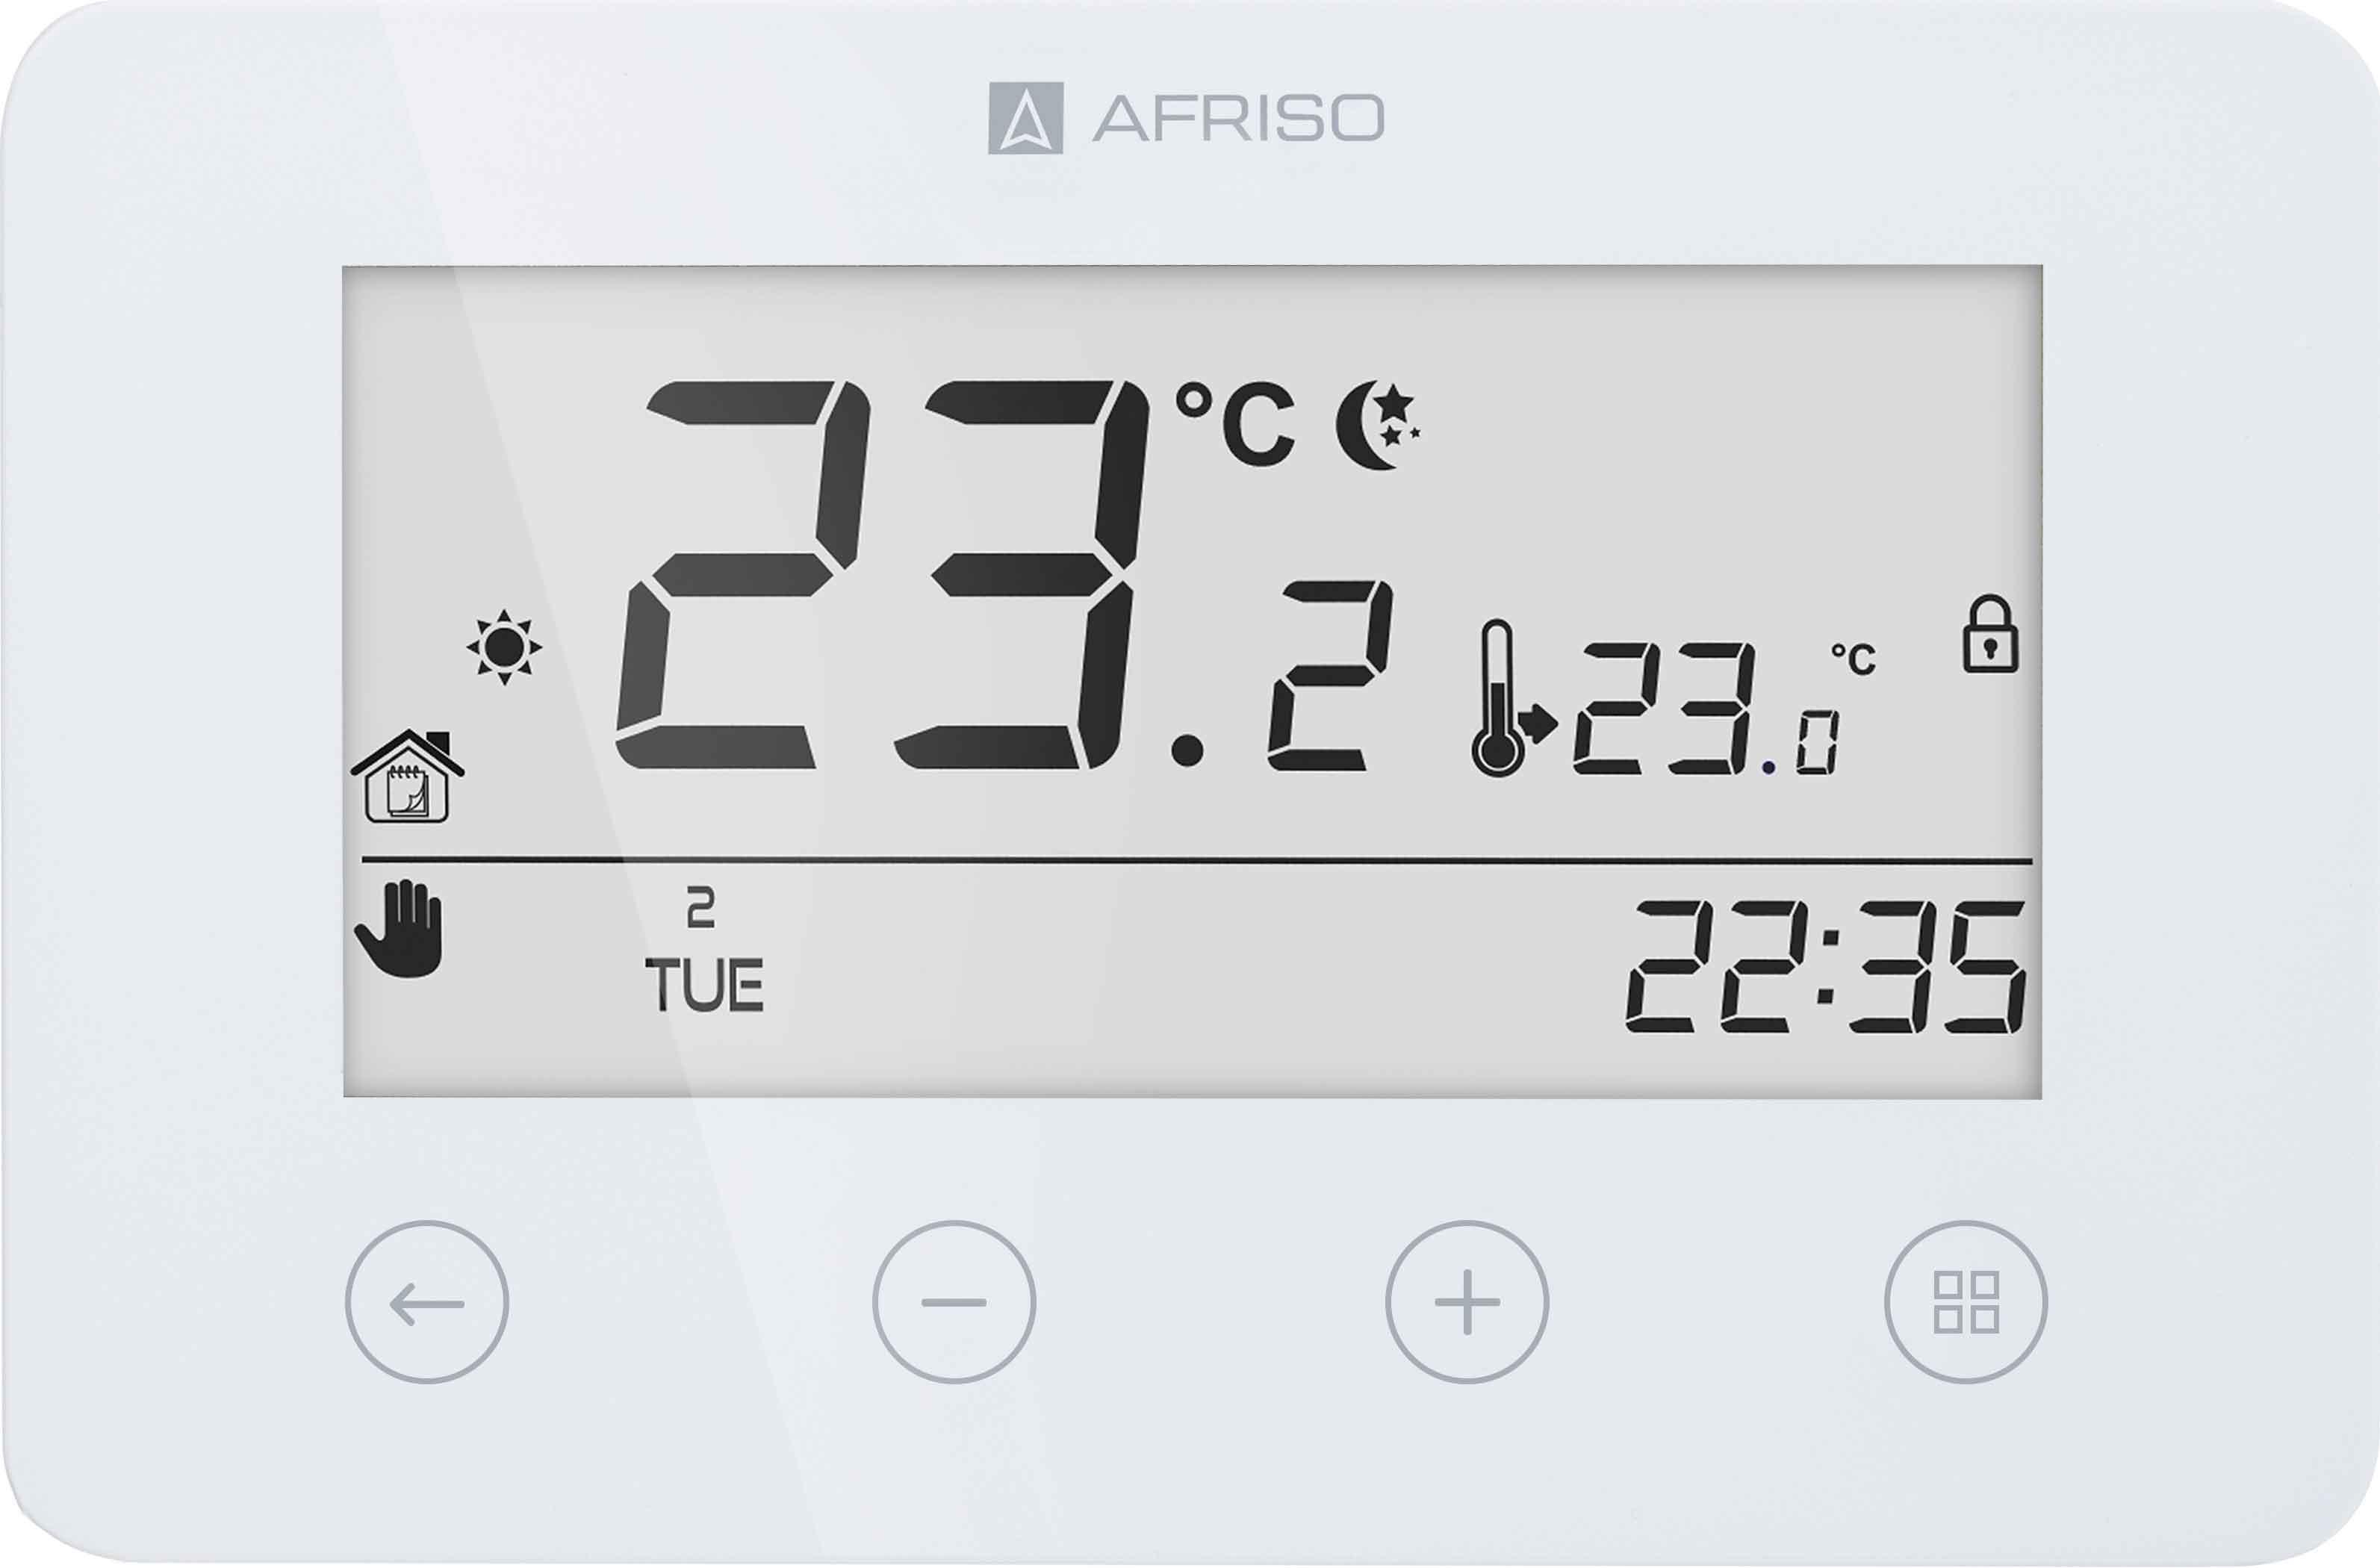 Programowalny termostat pokojowy FloorControl RT05 D-230 do listwy WB01 D-8-230, 230 V AC